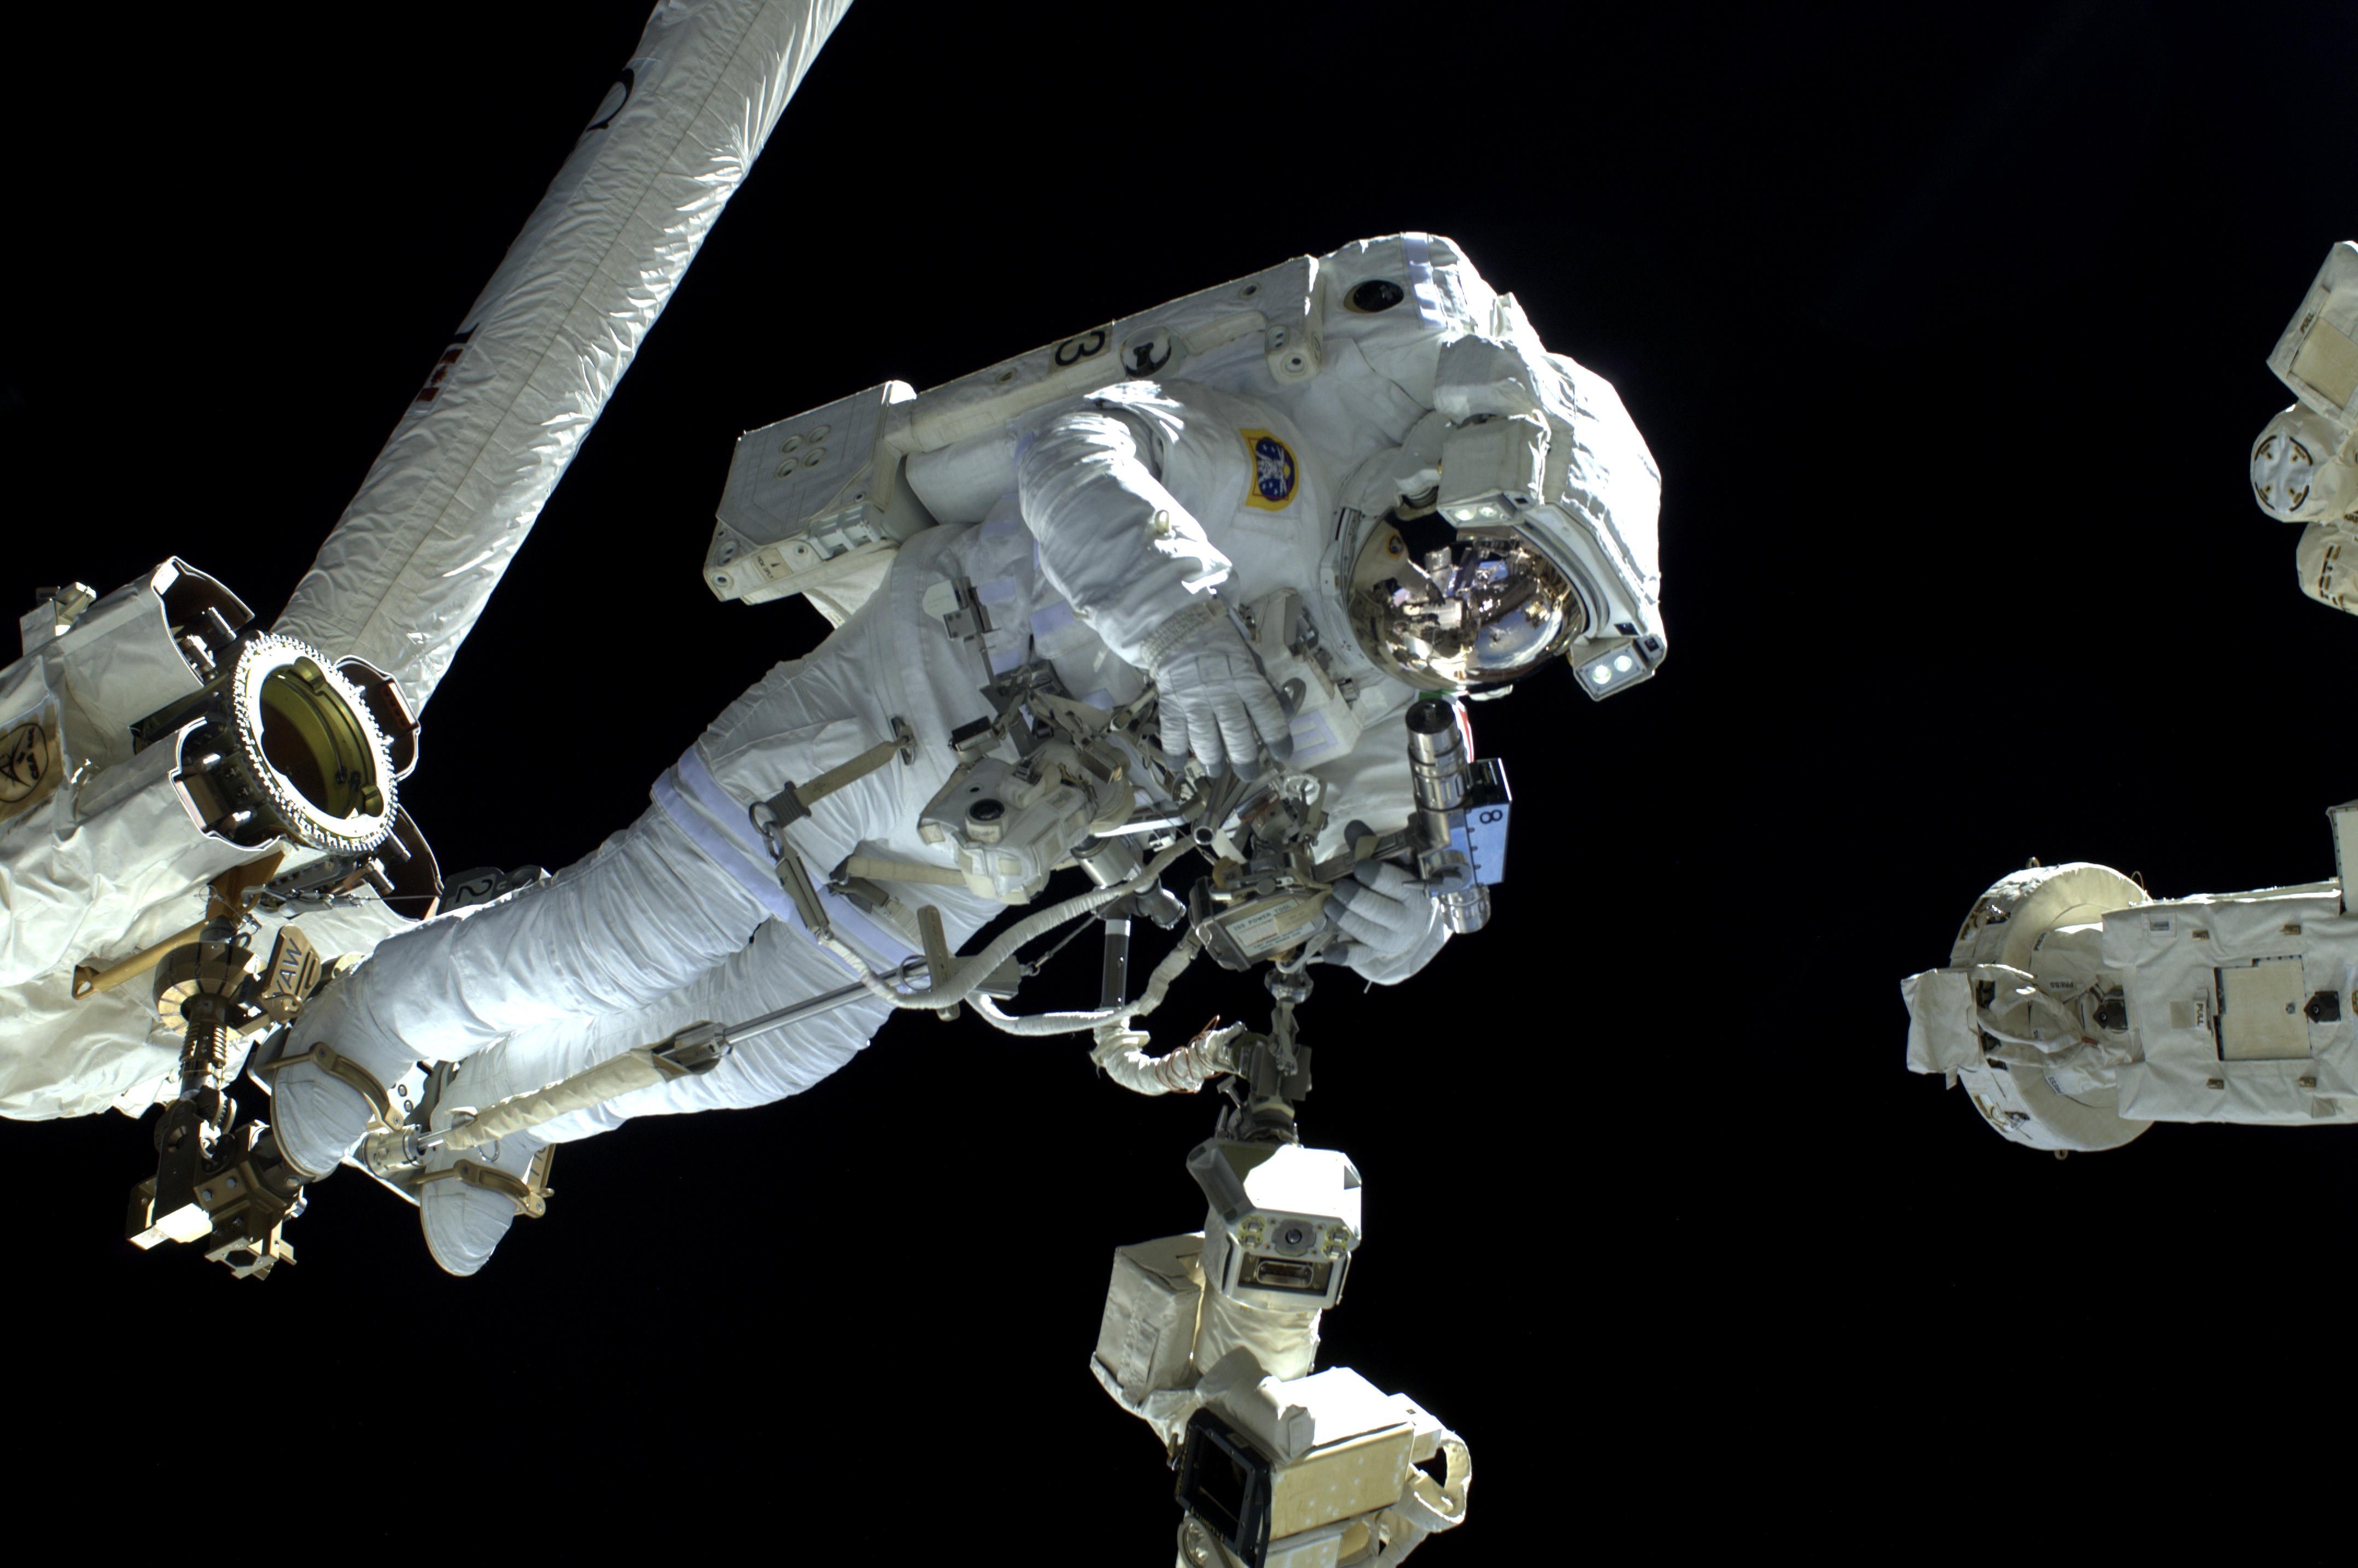 astronaut in the spacecraft - photo #48